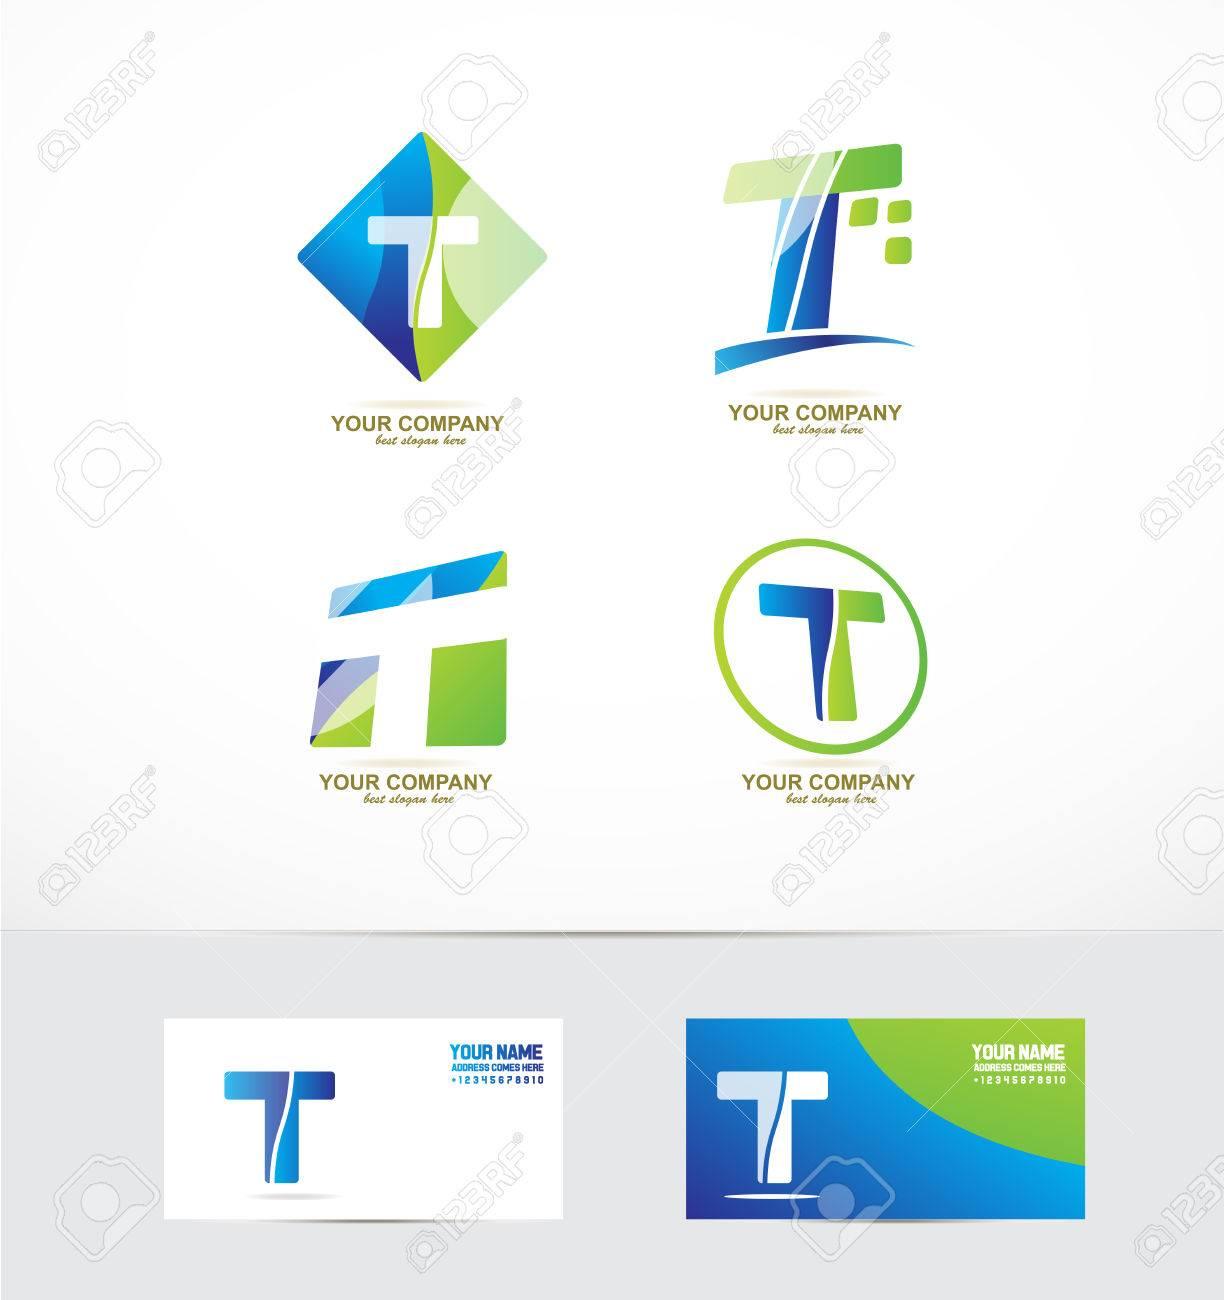 company logo icon element template alphabet letter t set - 53334060